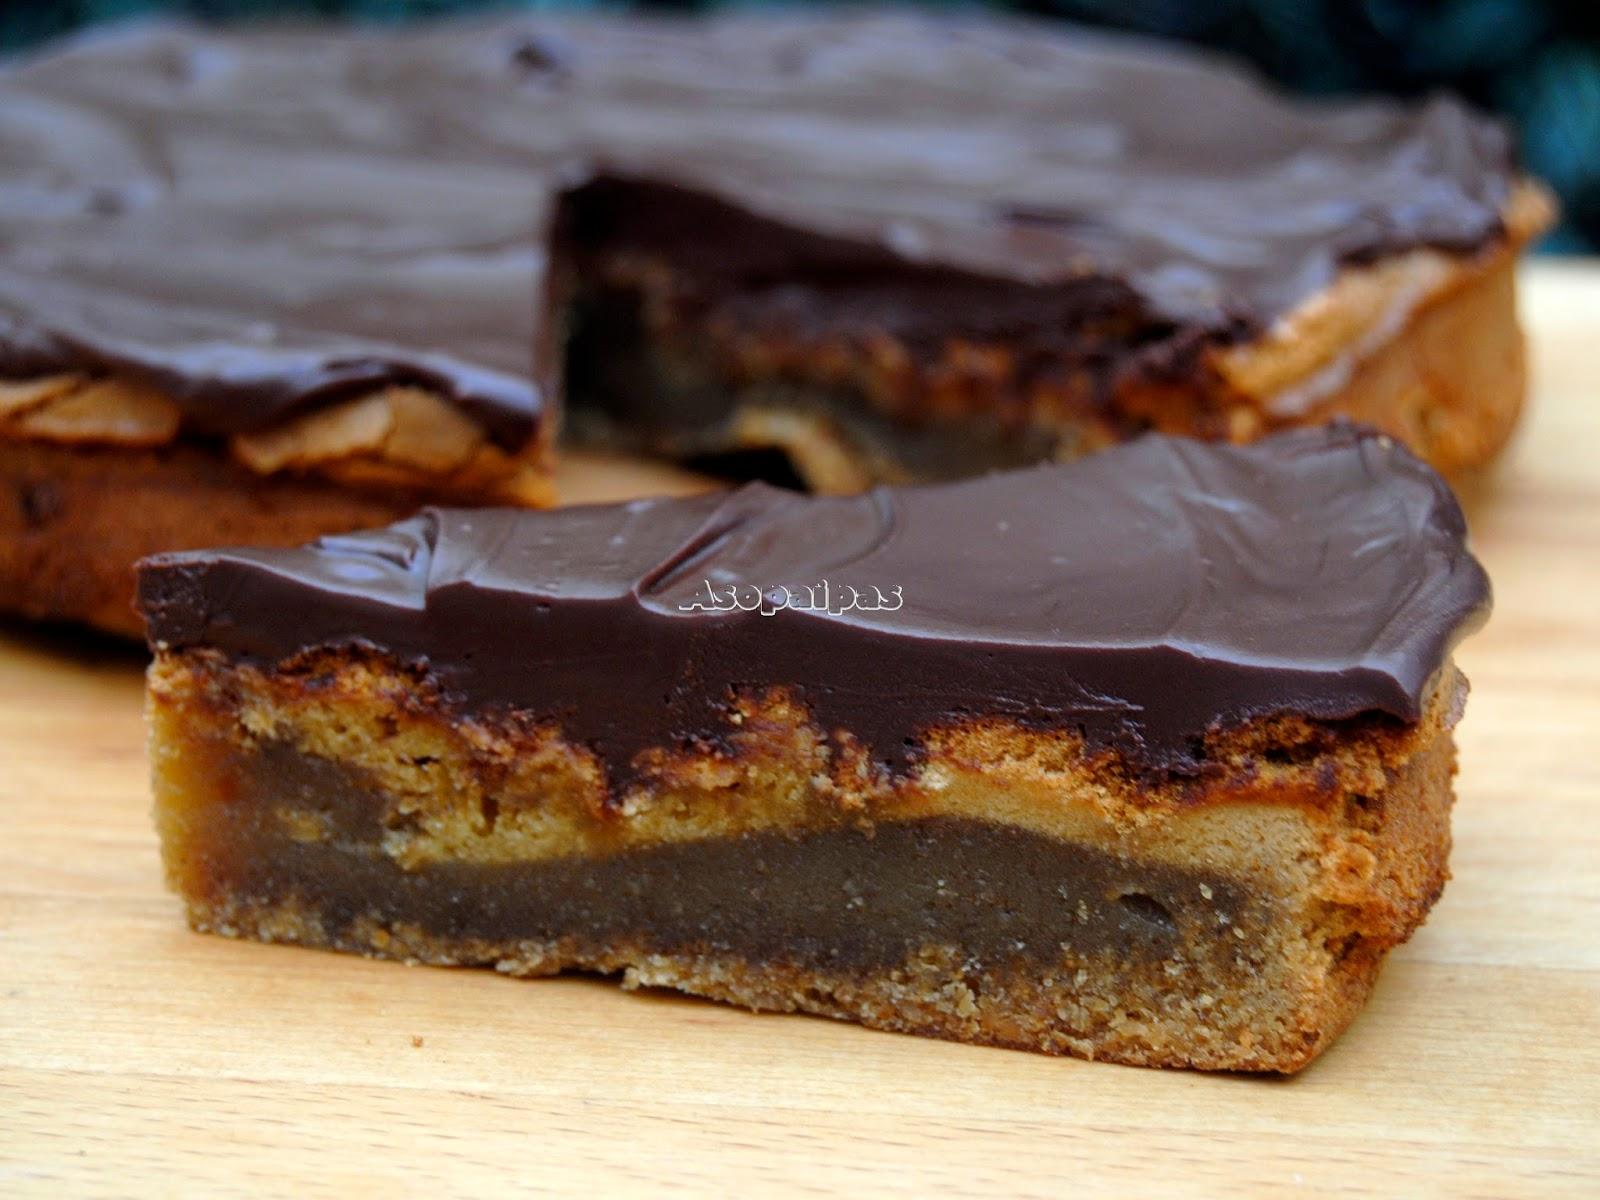 Torta de Almendras casera con corbetura de Chocolate